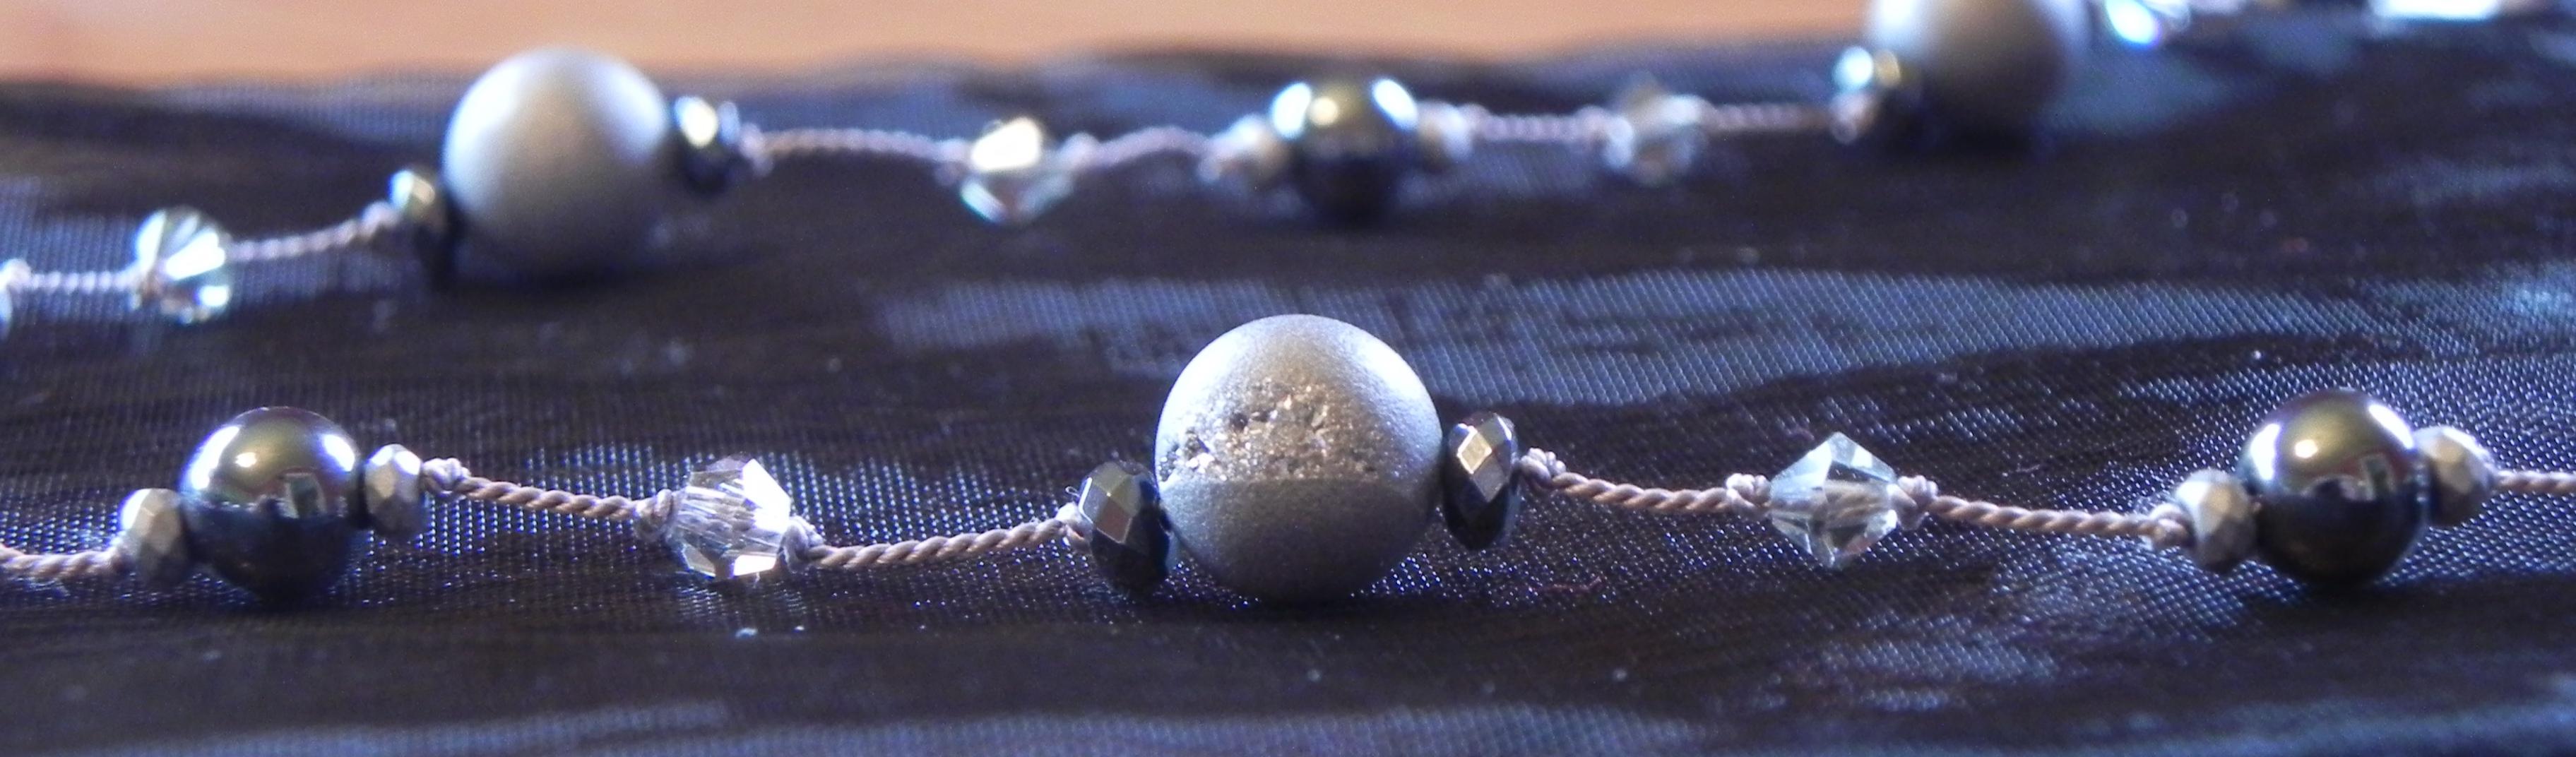 Gray Druzy Quartz Crystal & Hematite